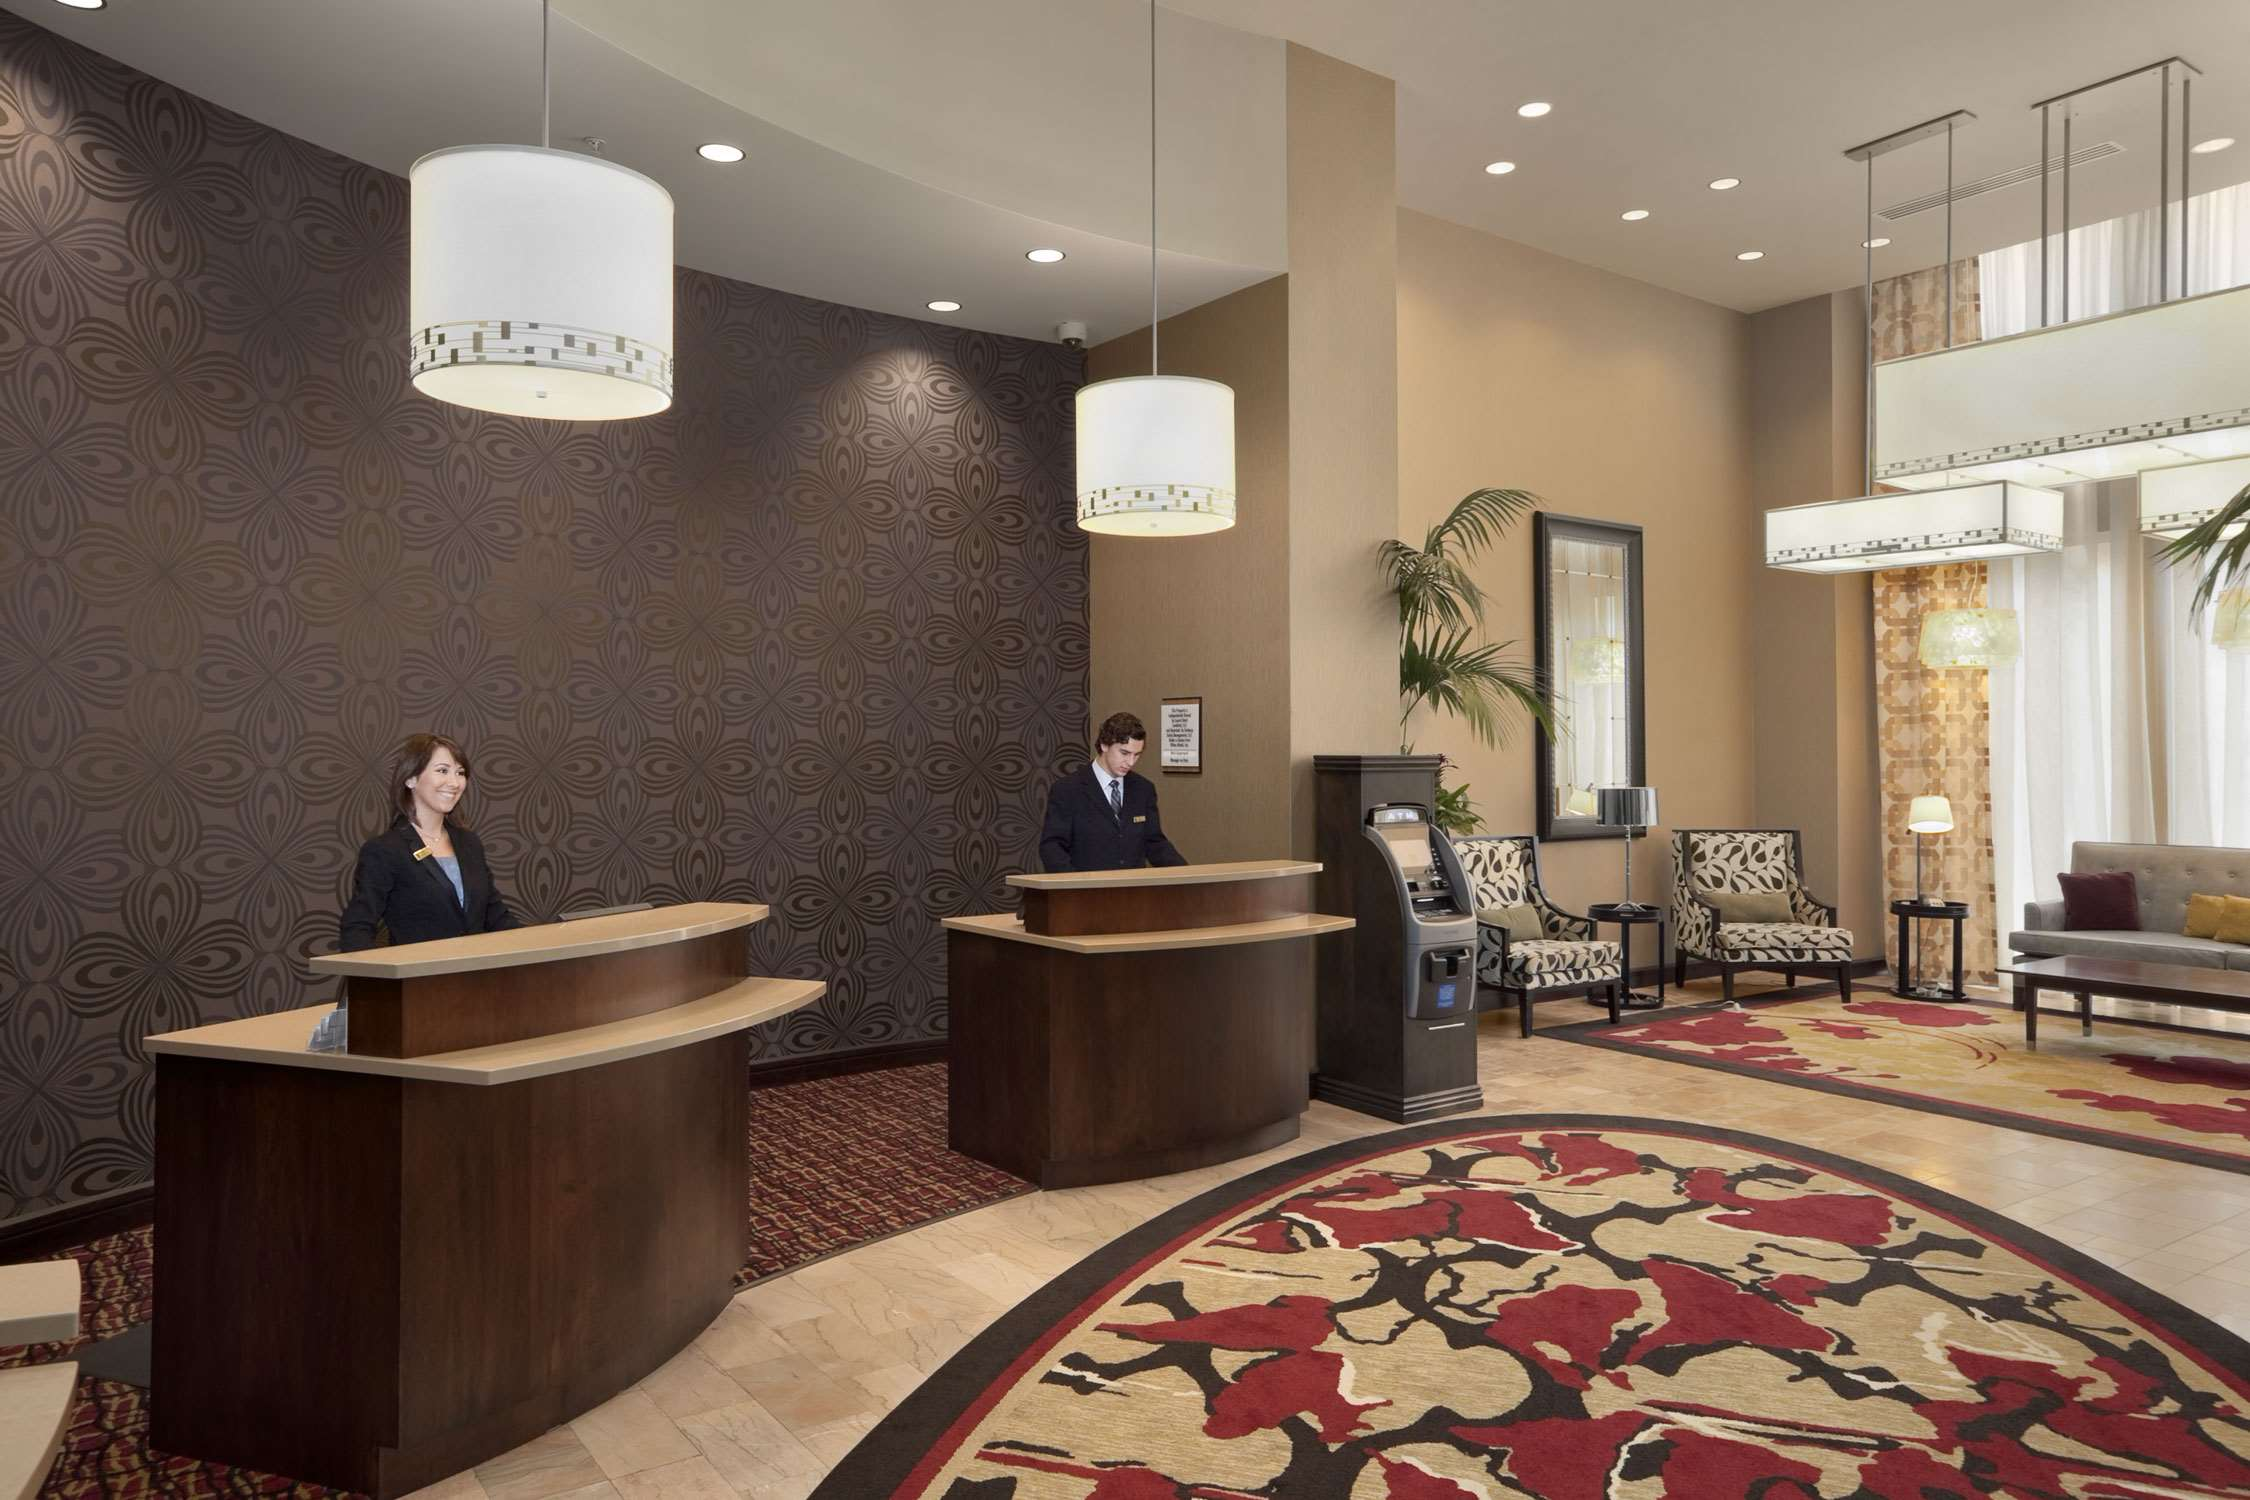 Embassy Suites by Hilton St. Louis Downtown